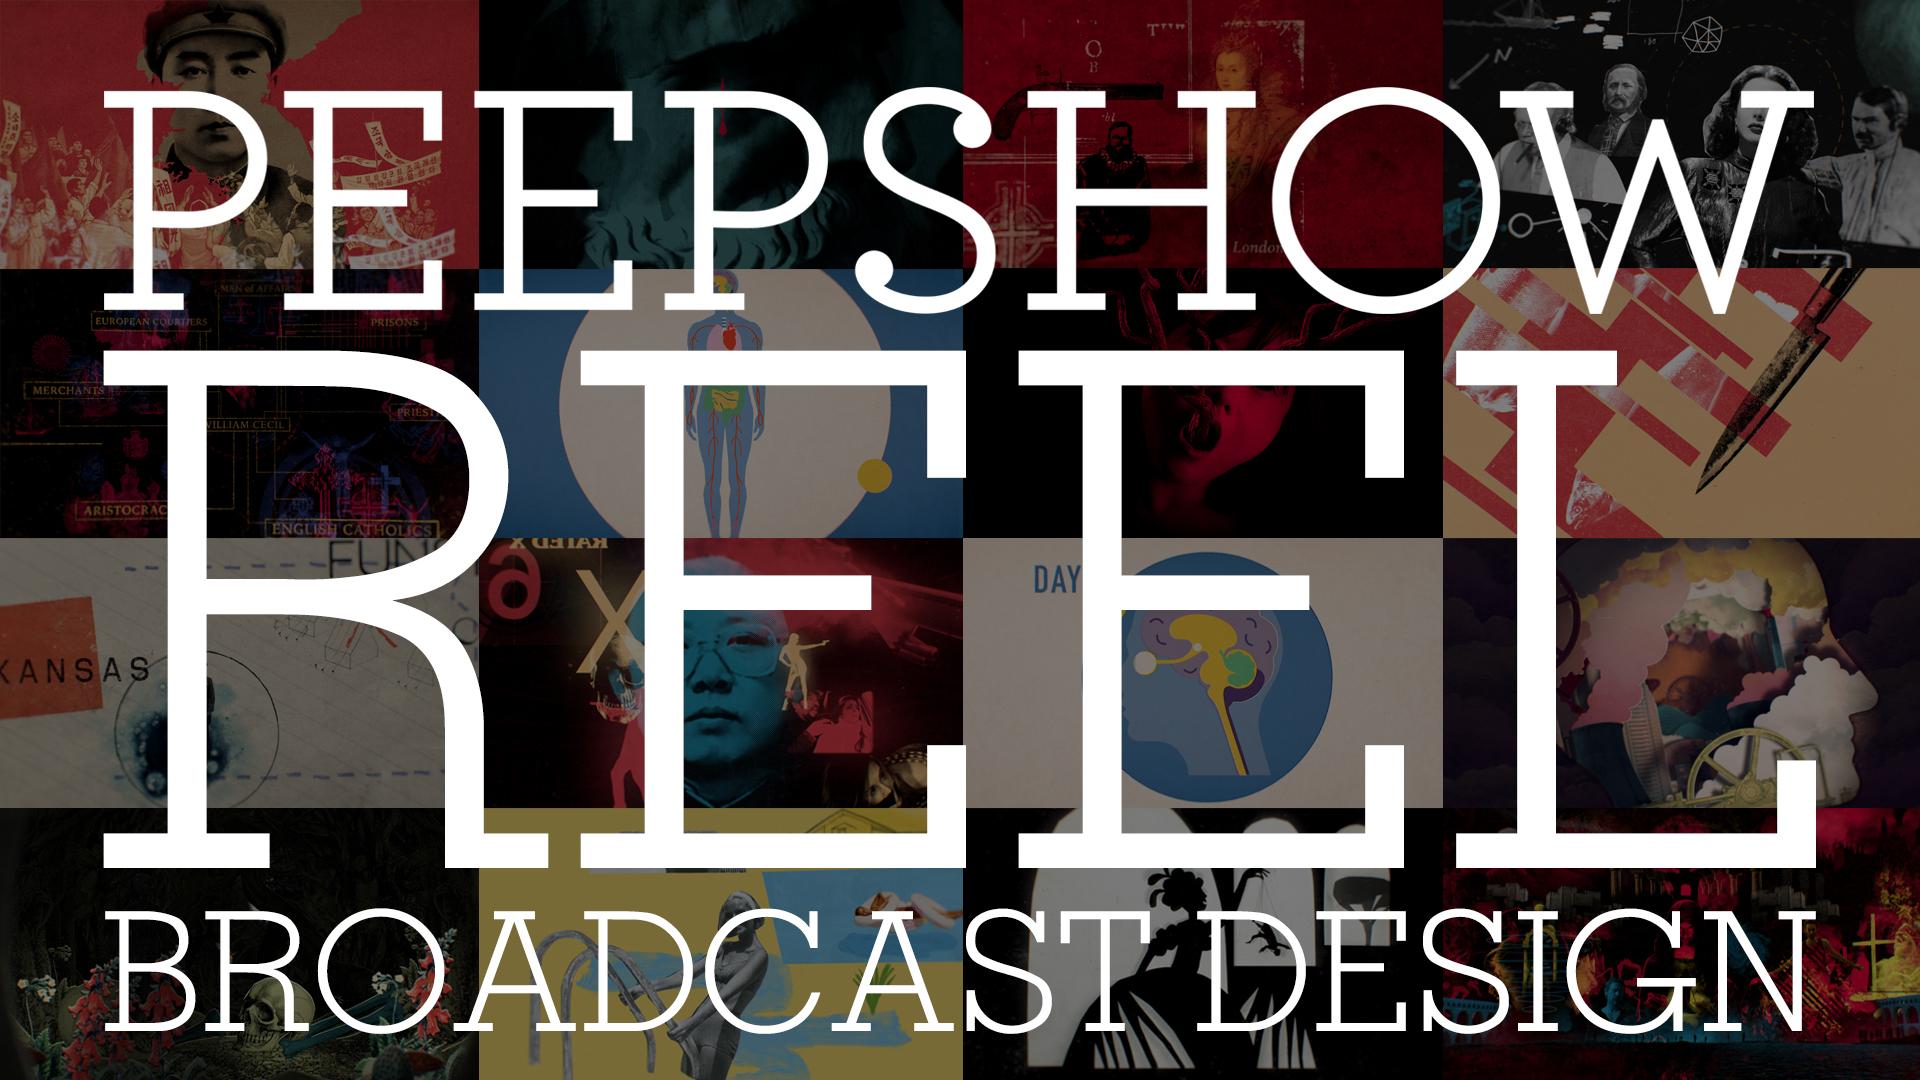 PeepShowReel: Broadcast Design | click to play